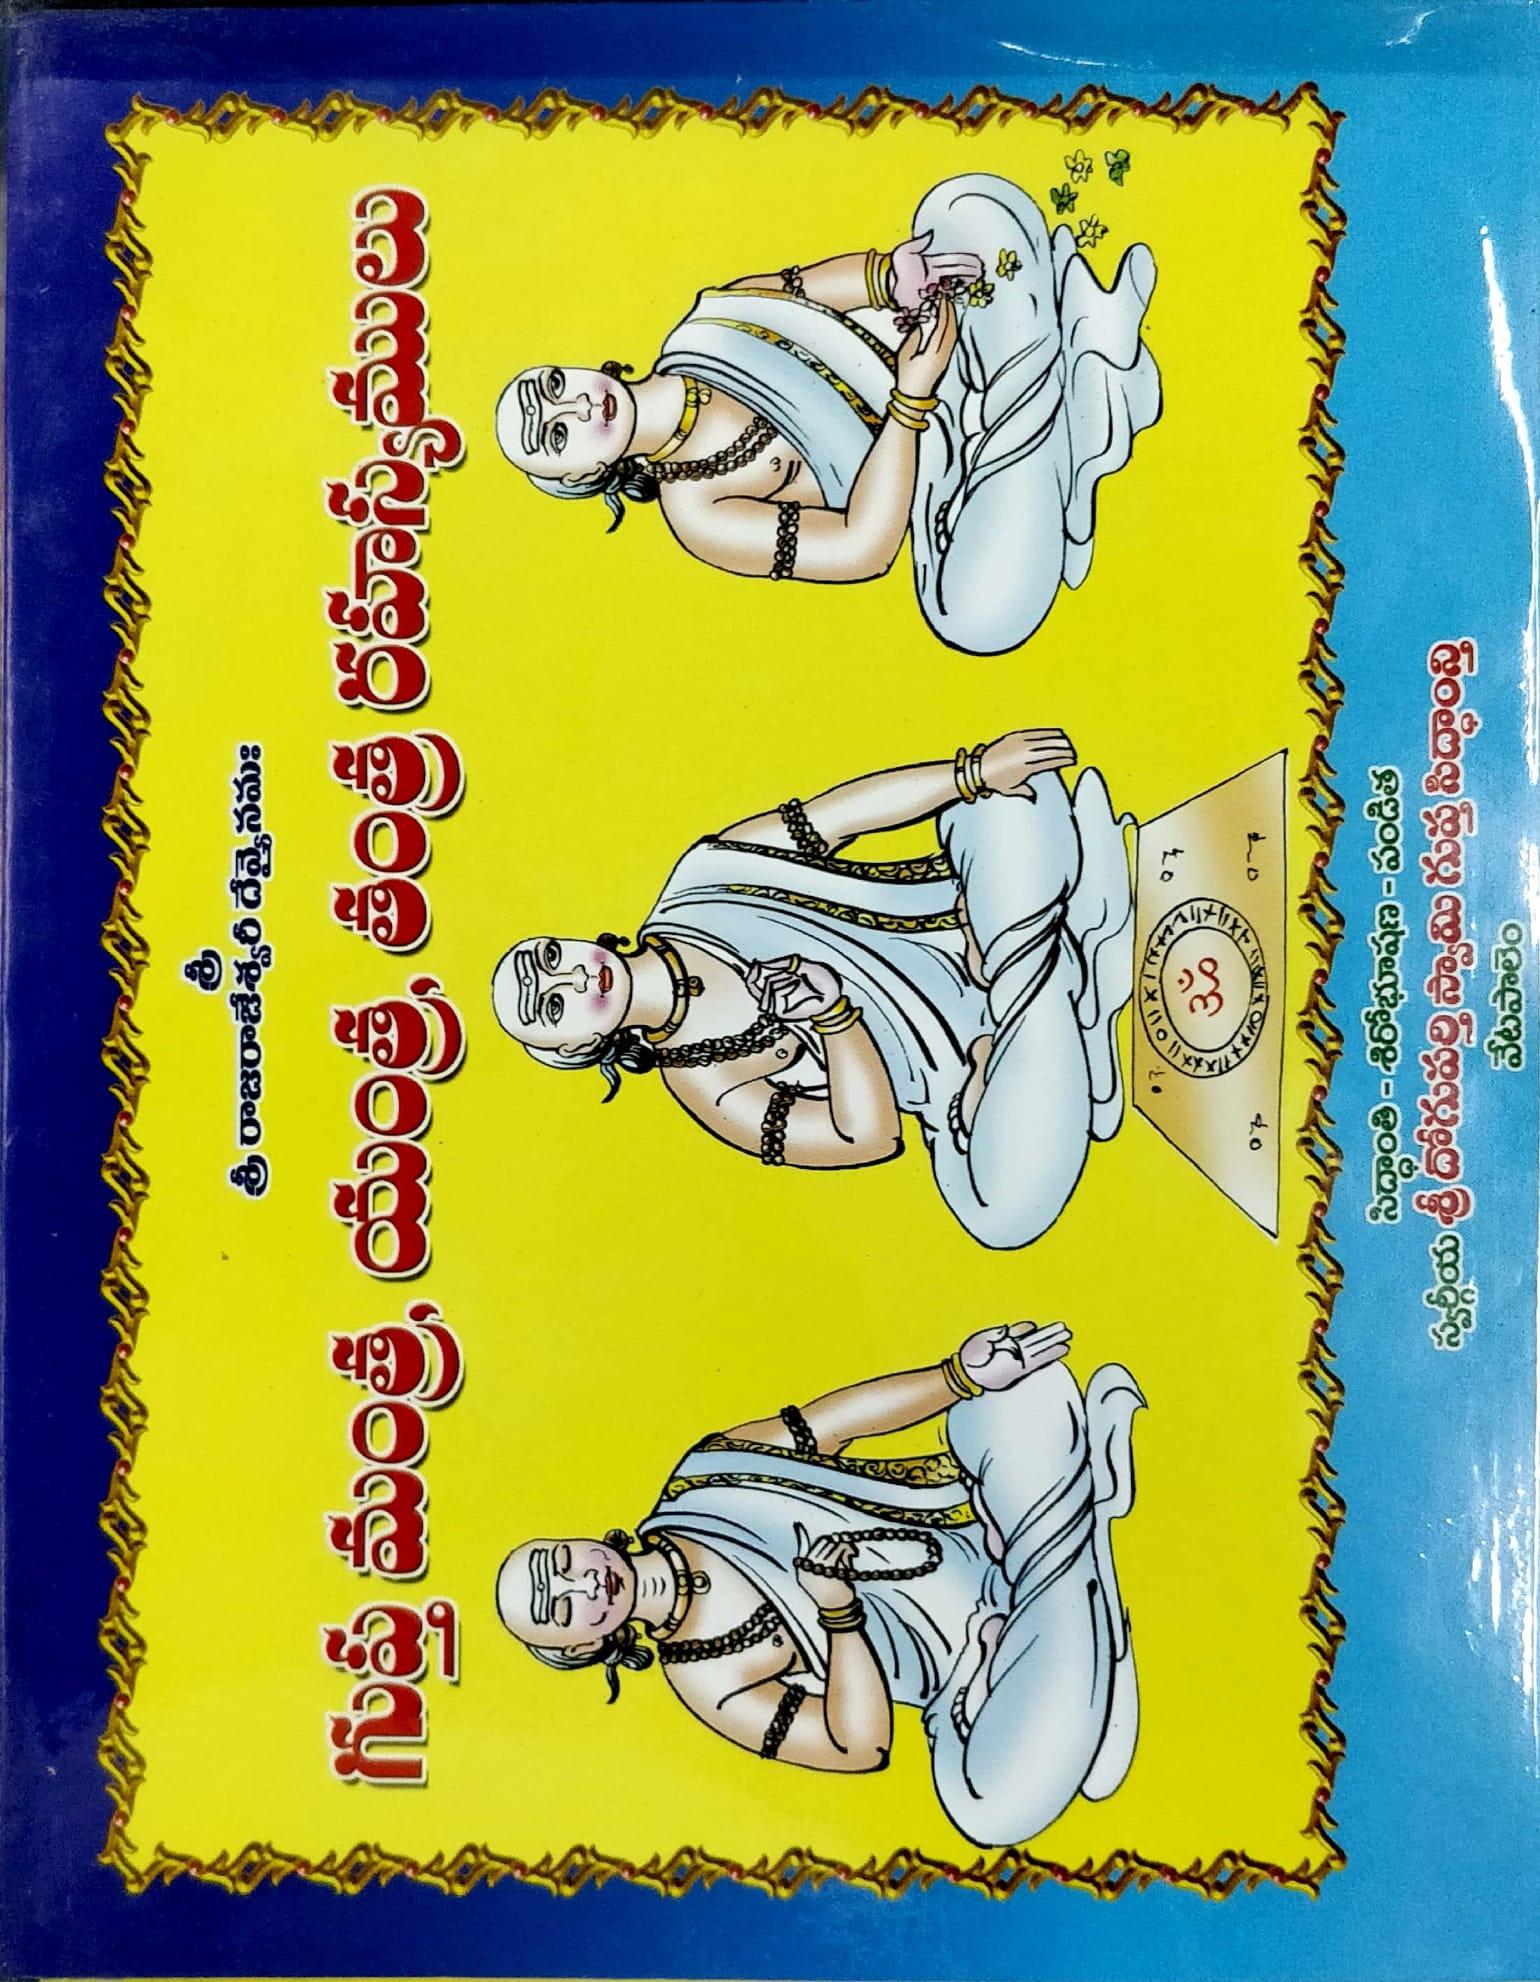 Gupta Mantra Yantra Tantra Rahasyamulu